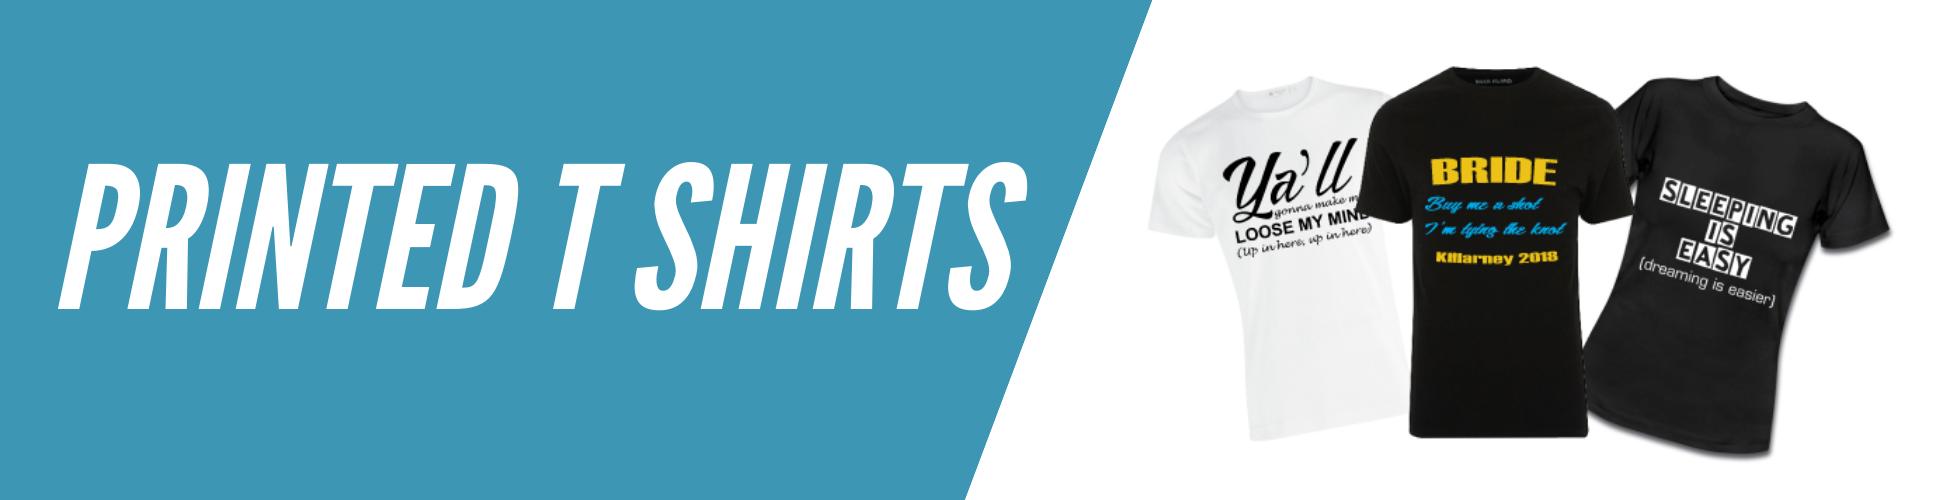 printed-t-shirts-banner-v2.png